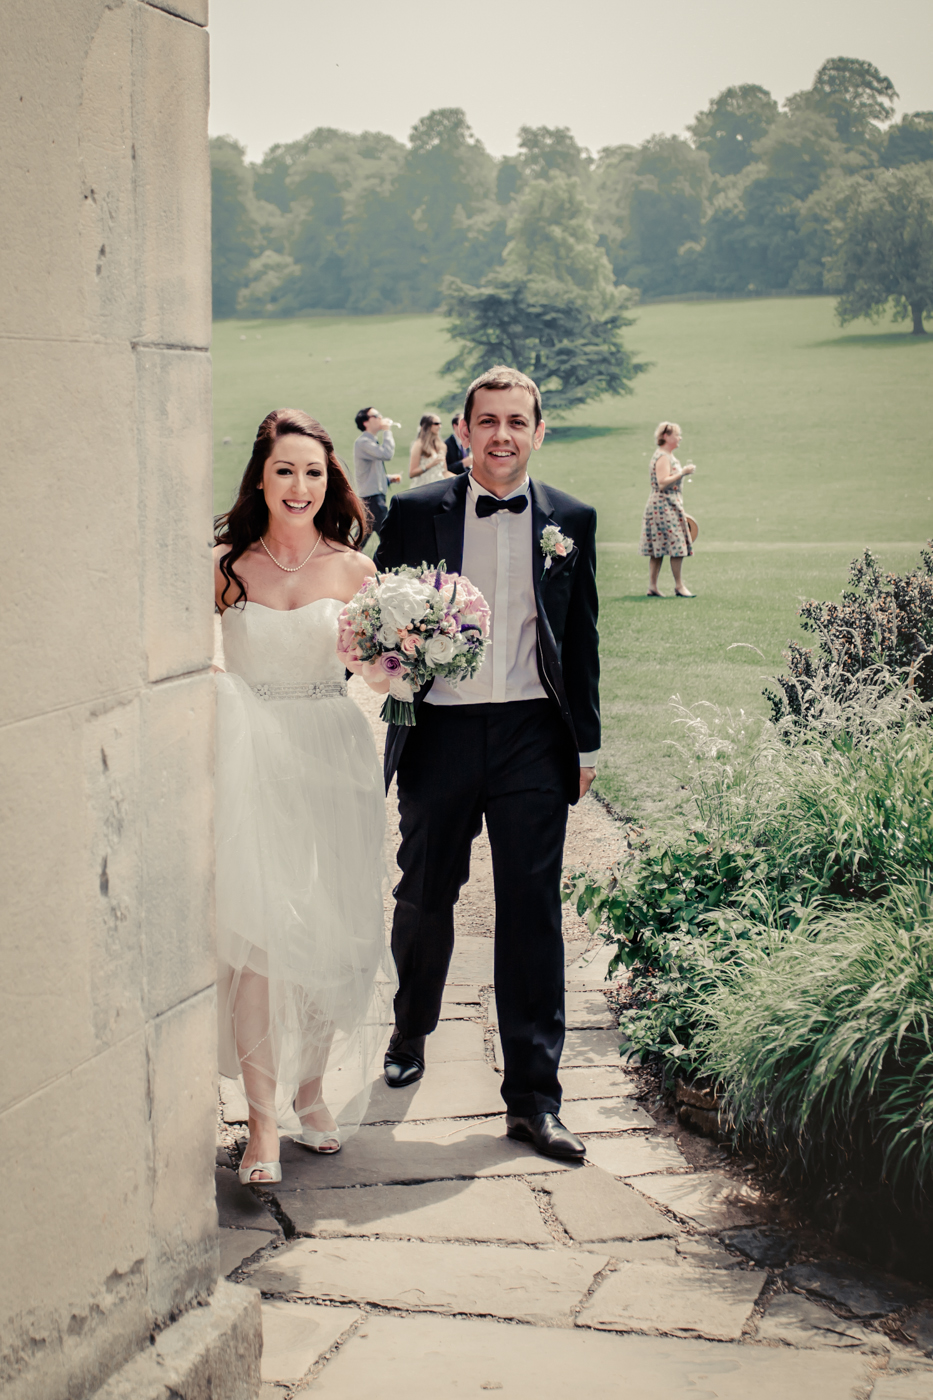 105 - Abi and Chris at Kedleston Hall - Wedding Photography by Mark Pugh www.markpugh.com - 0390.JPG